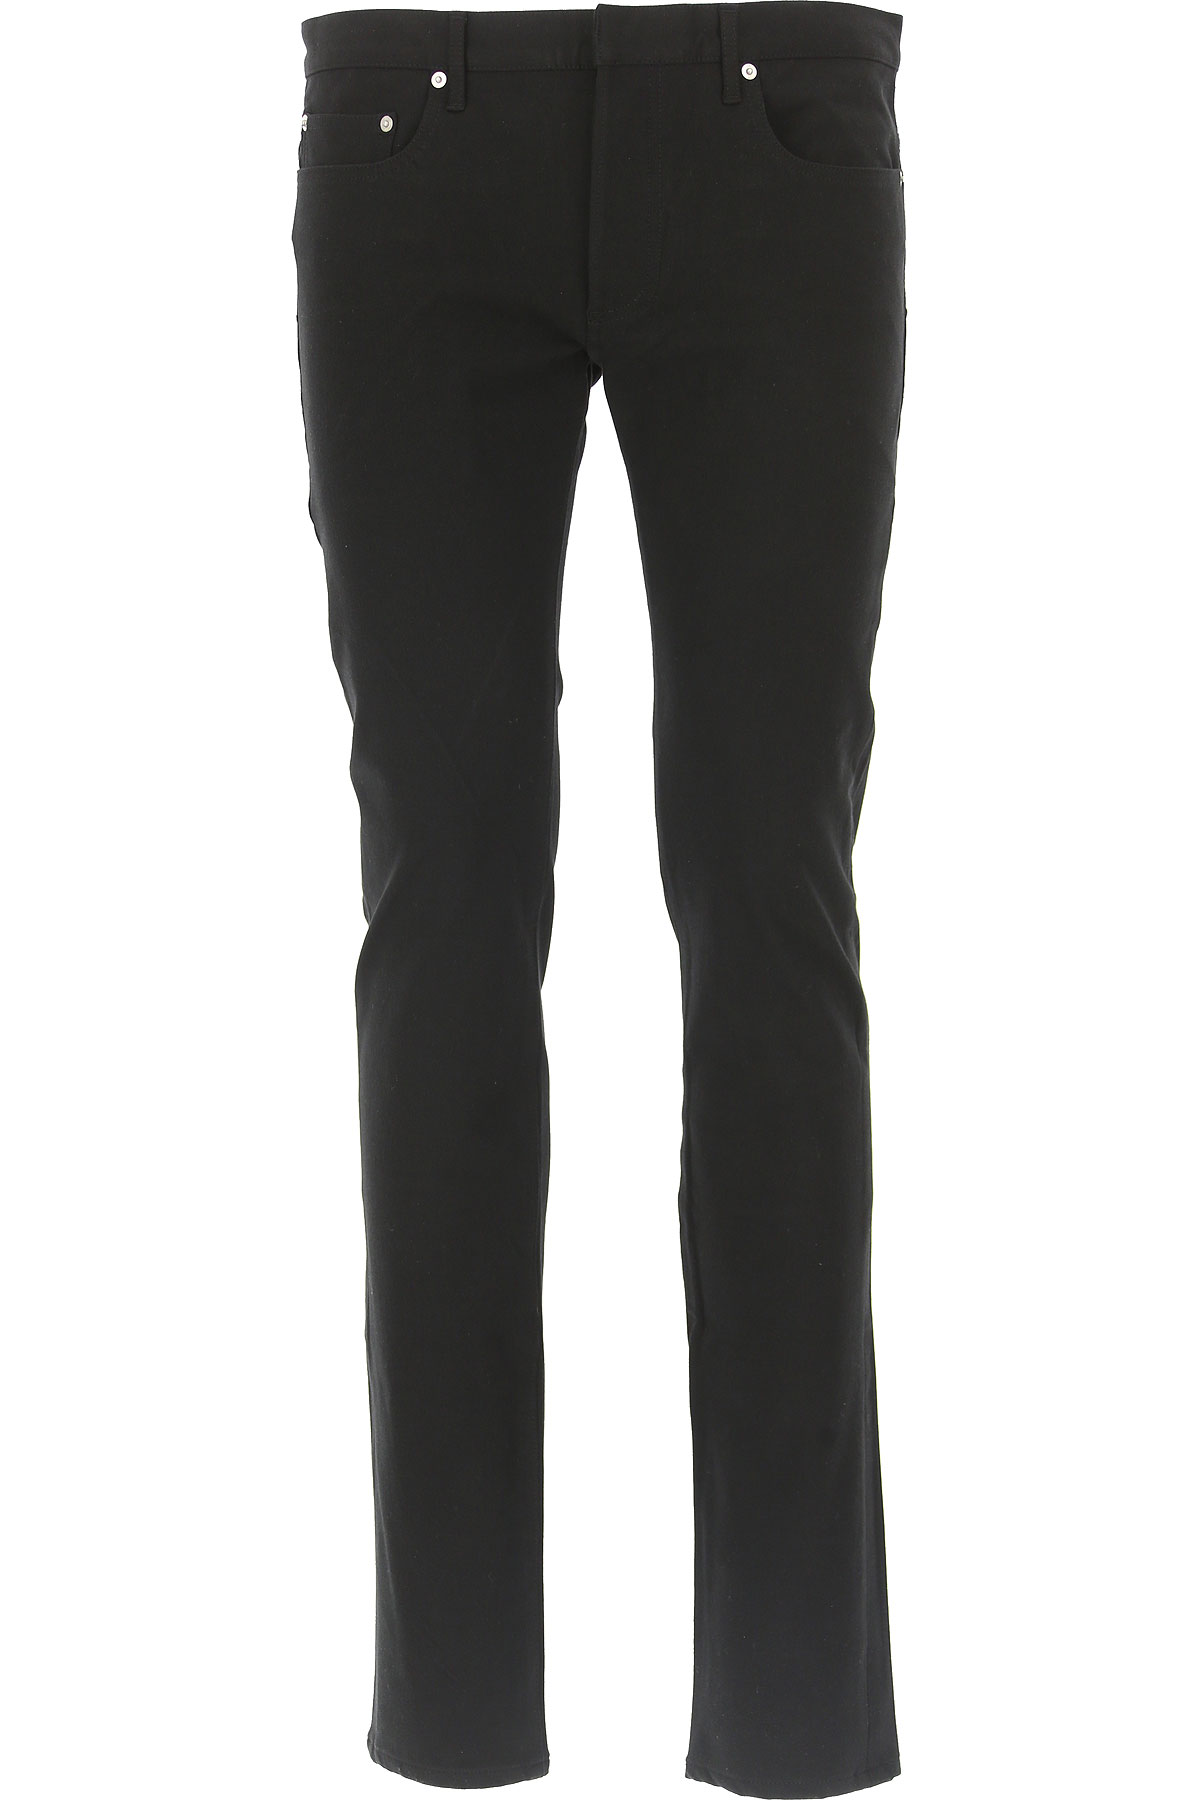 Christian Dior Jeans On Sale in Outlet, Black, Viscose, 2019, 31 32 33